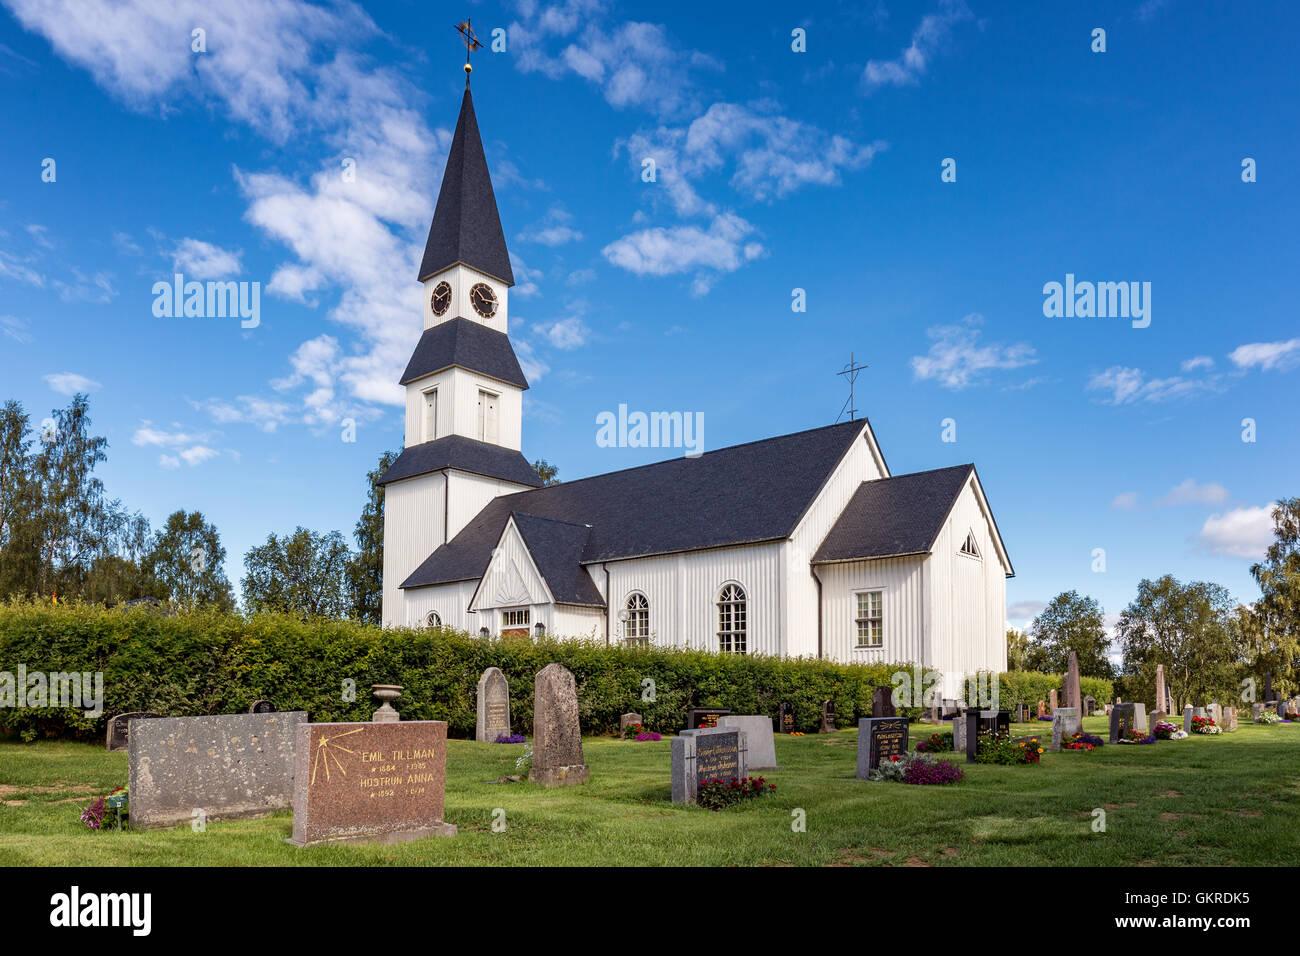 Särna Church, Älvdalen Municipality, Dalarna County, Sweden - Stock Image